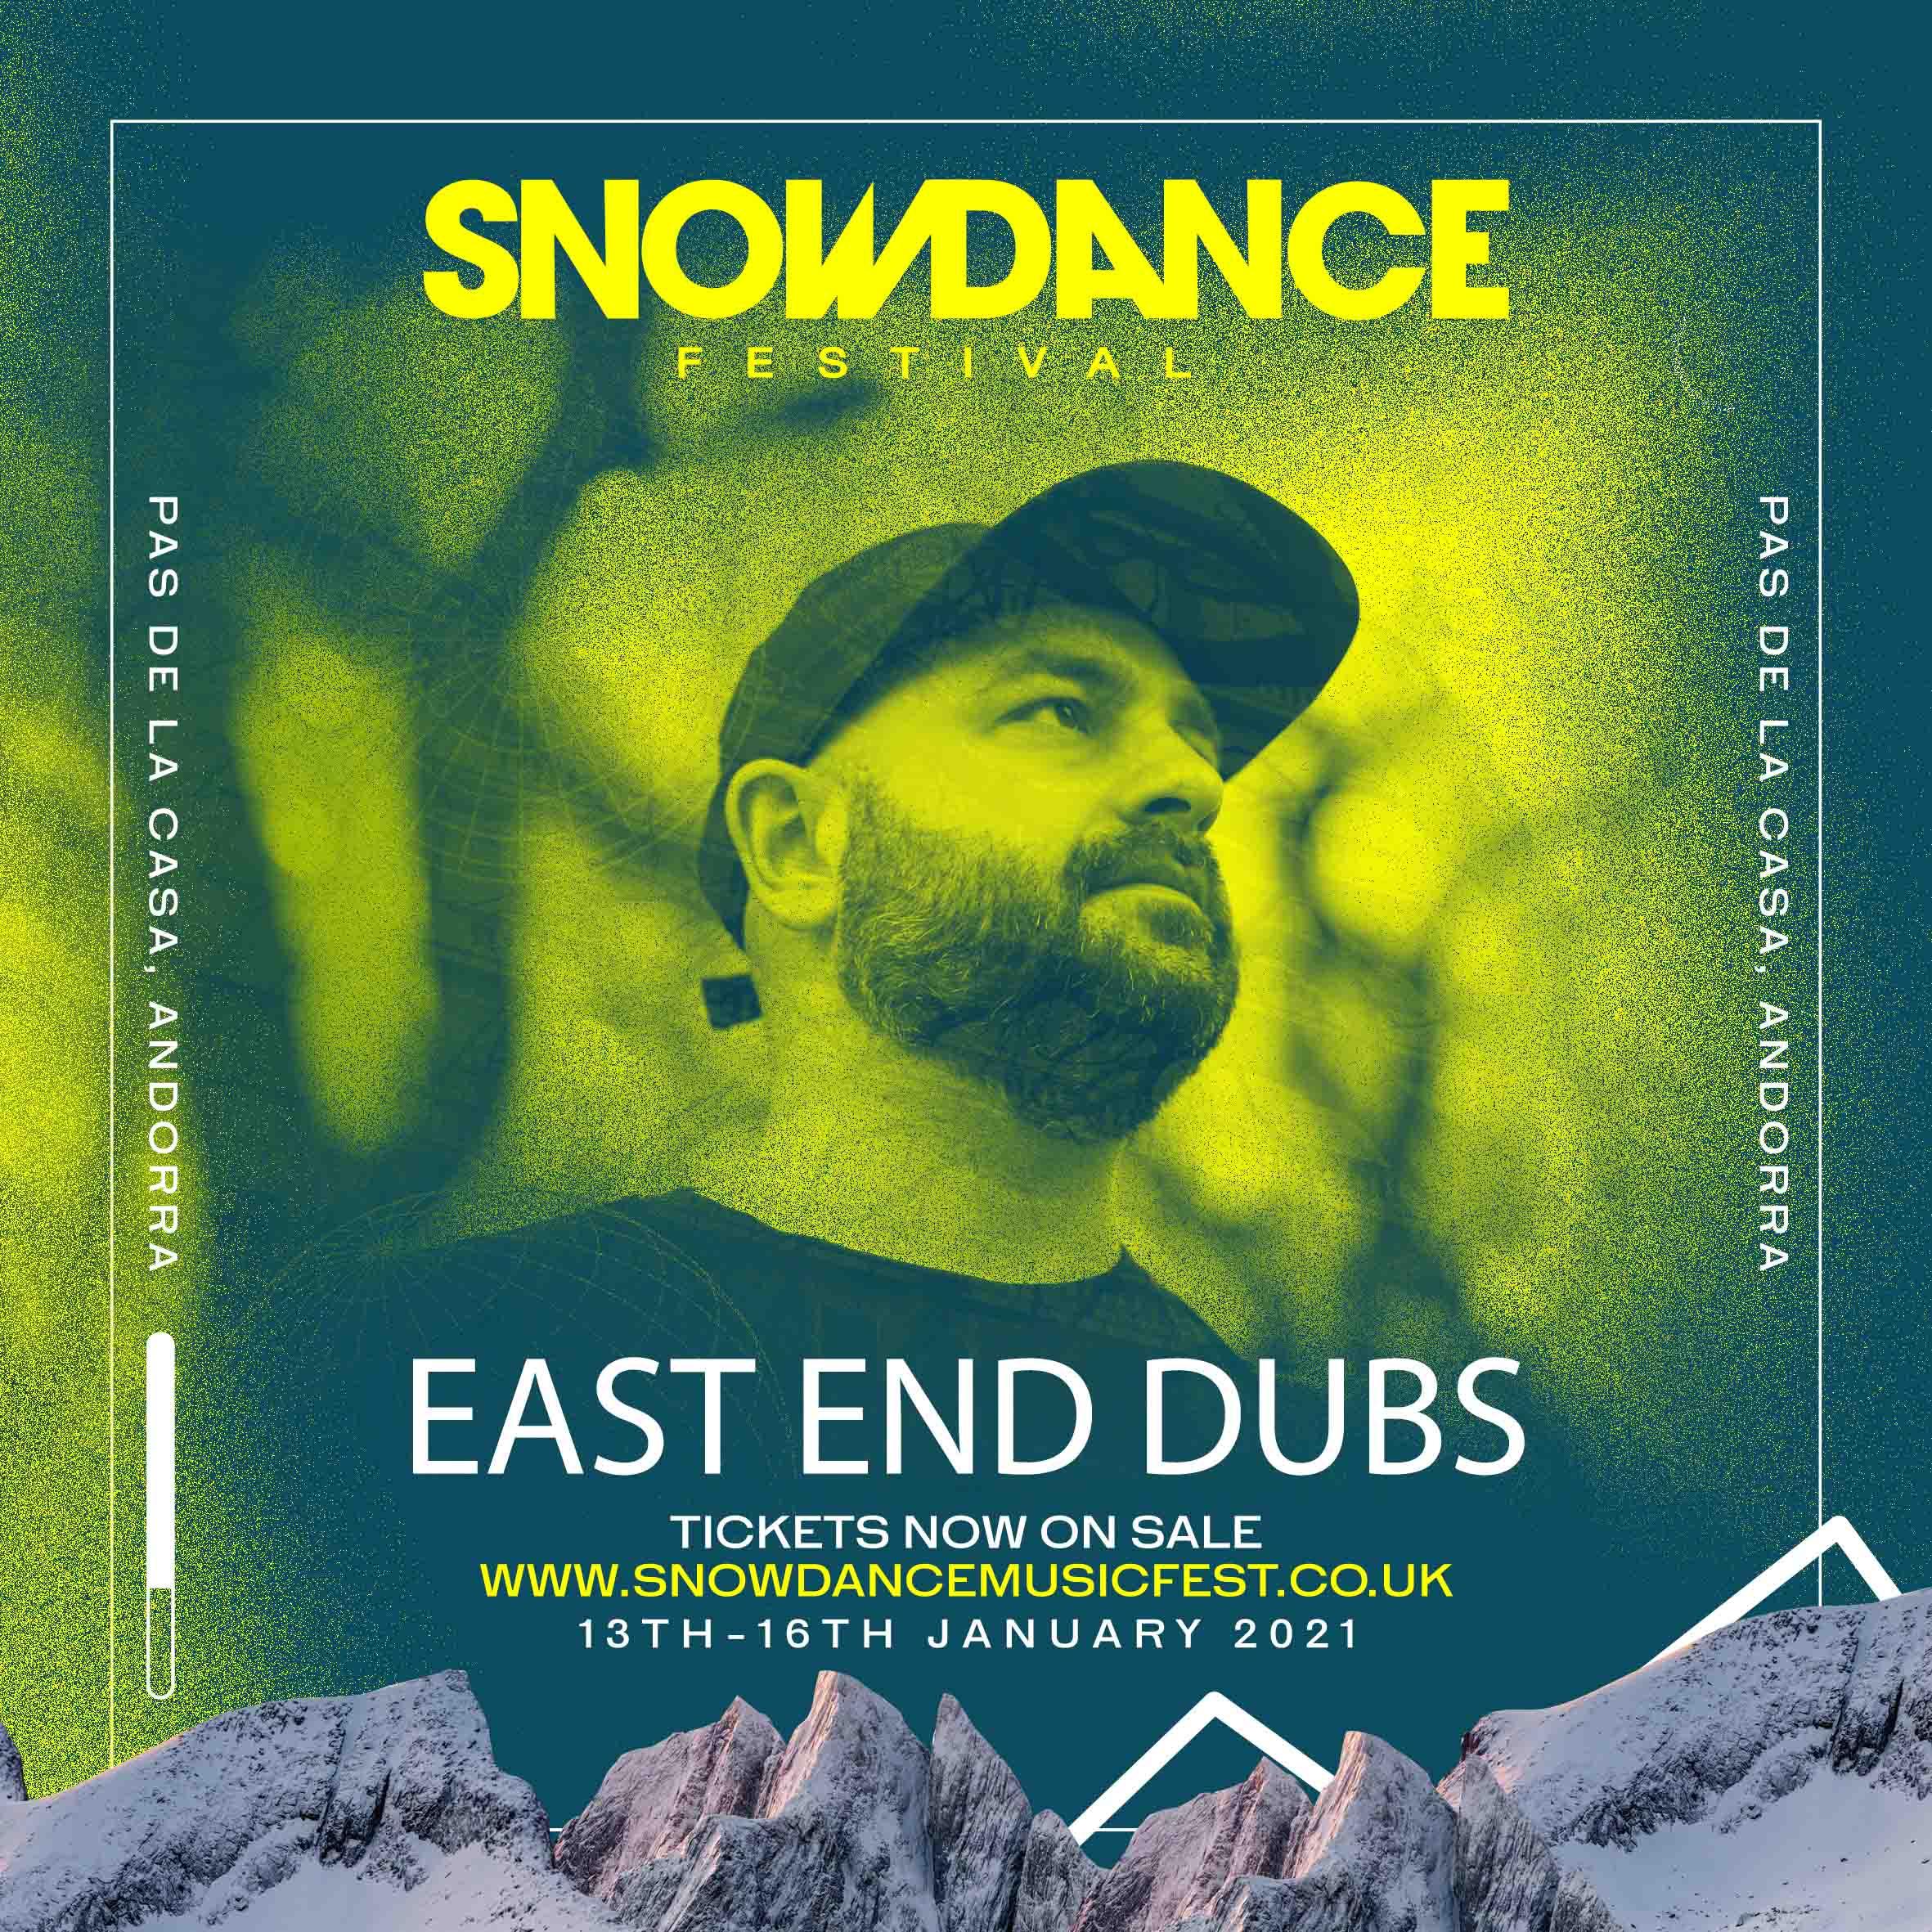 SnowDance festival eastend dubs